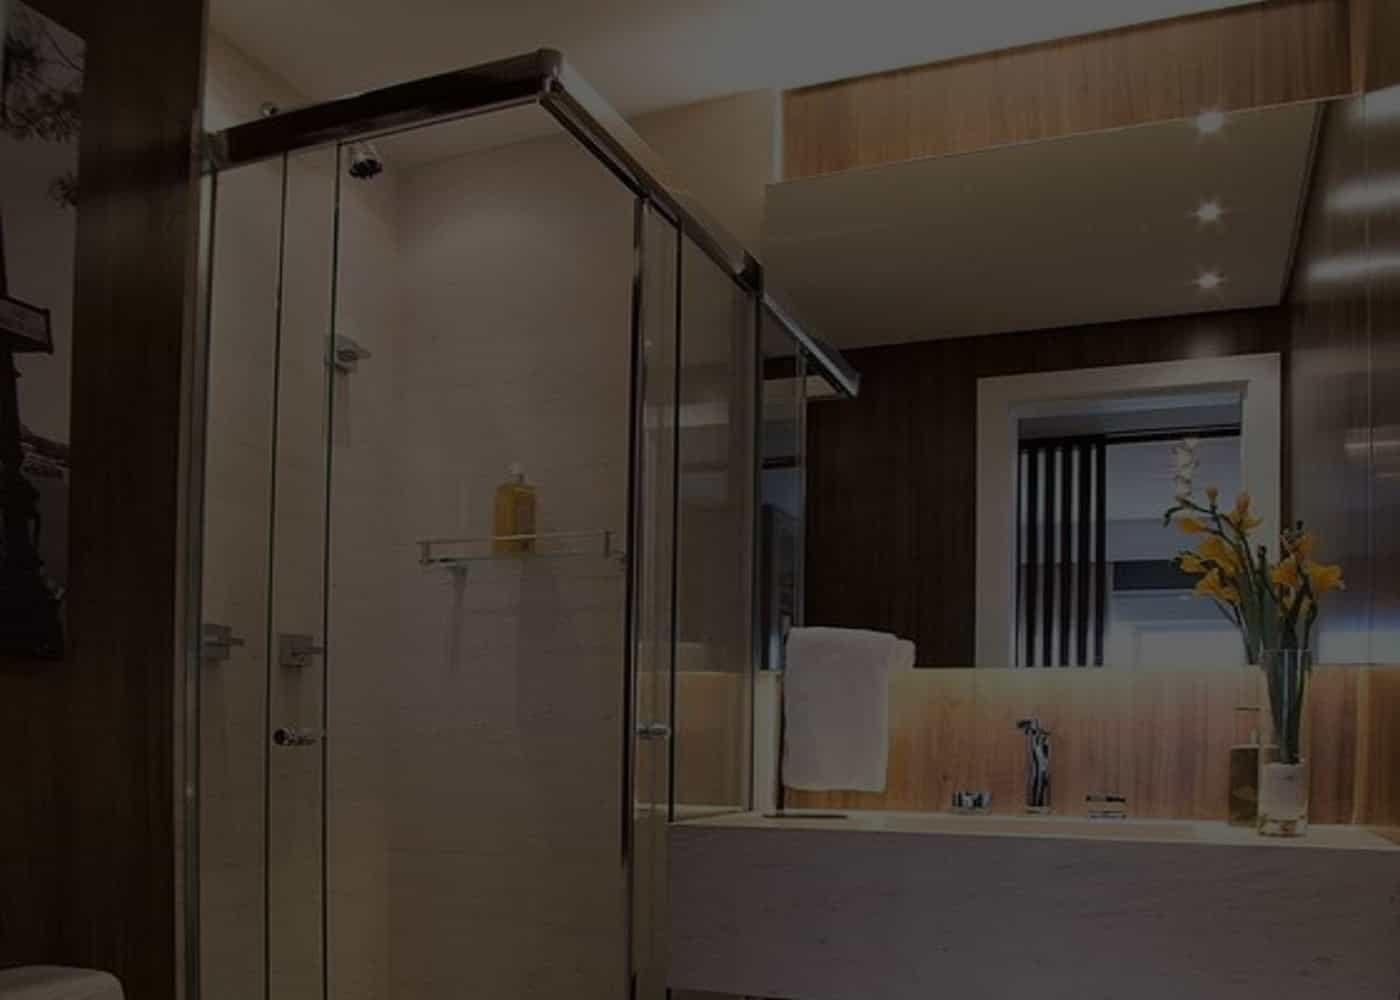 Box-para-Banheiro-de-vidro-SOBOX, Box de Banheiro, Box sobre Medida para Todos os Tipos de Banheiros Novos ou Reformados Recentemente.